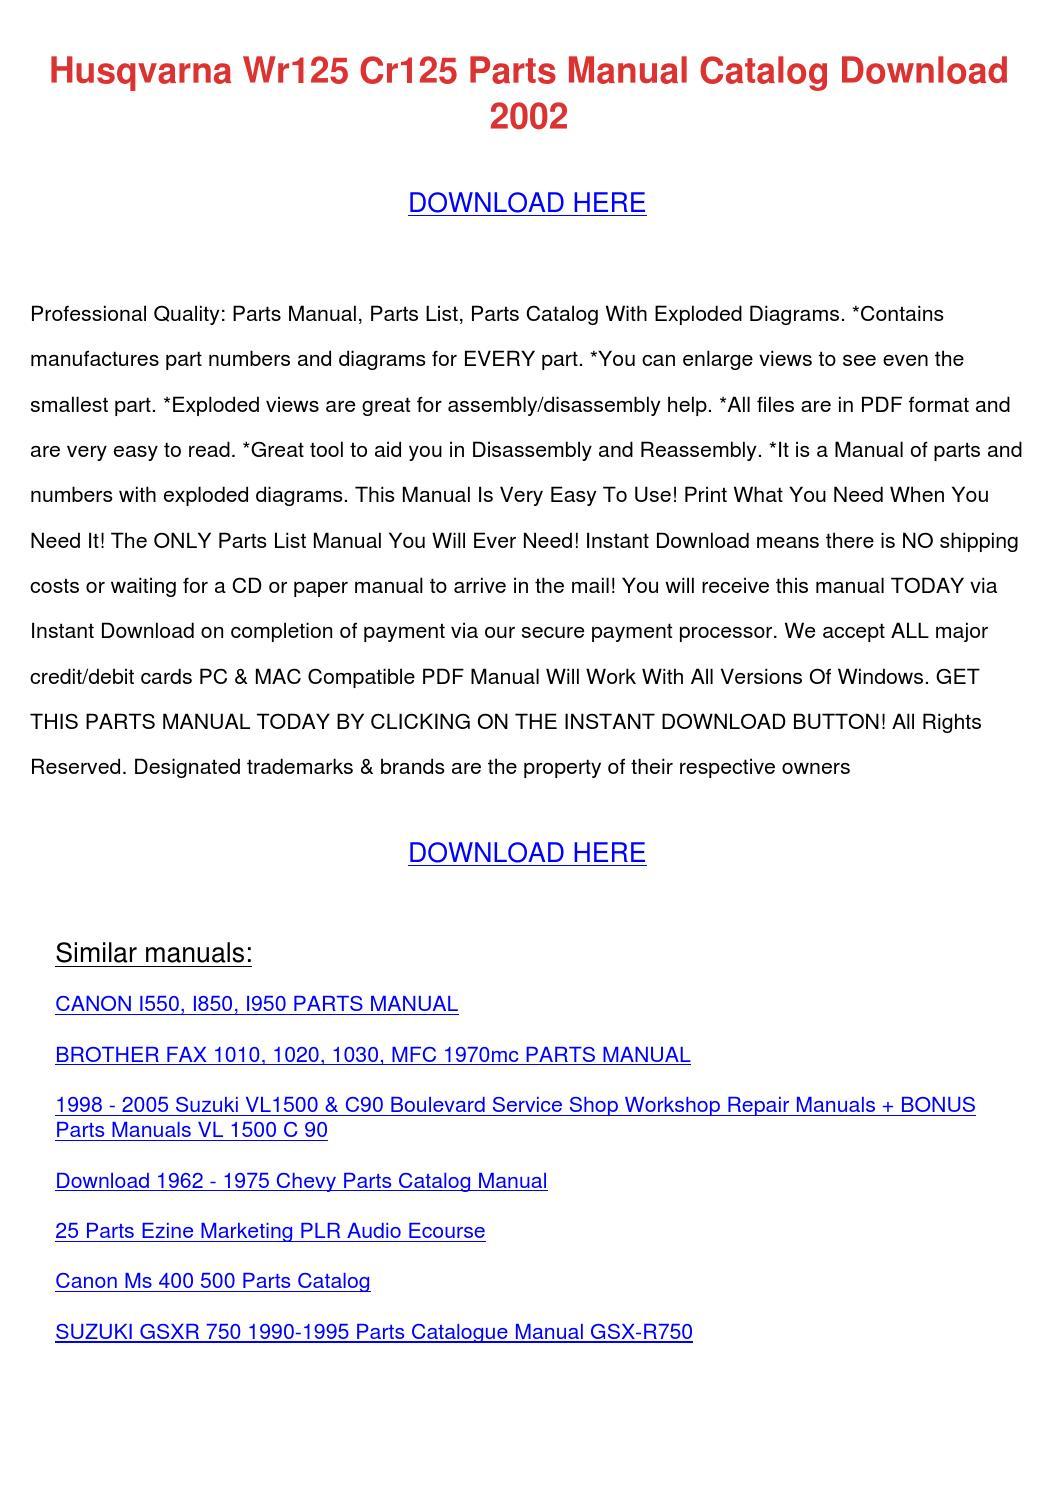 Husqvarna Wr125 Cr125 Parts Manual Catalog Do by CerysBriley - issuu